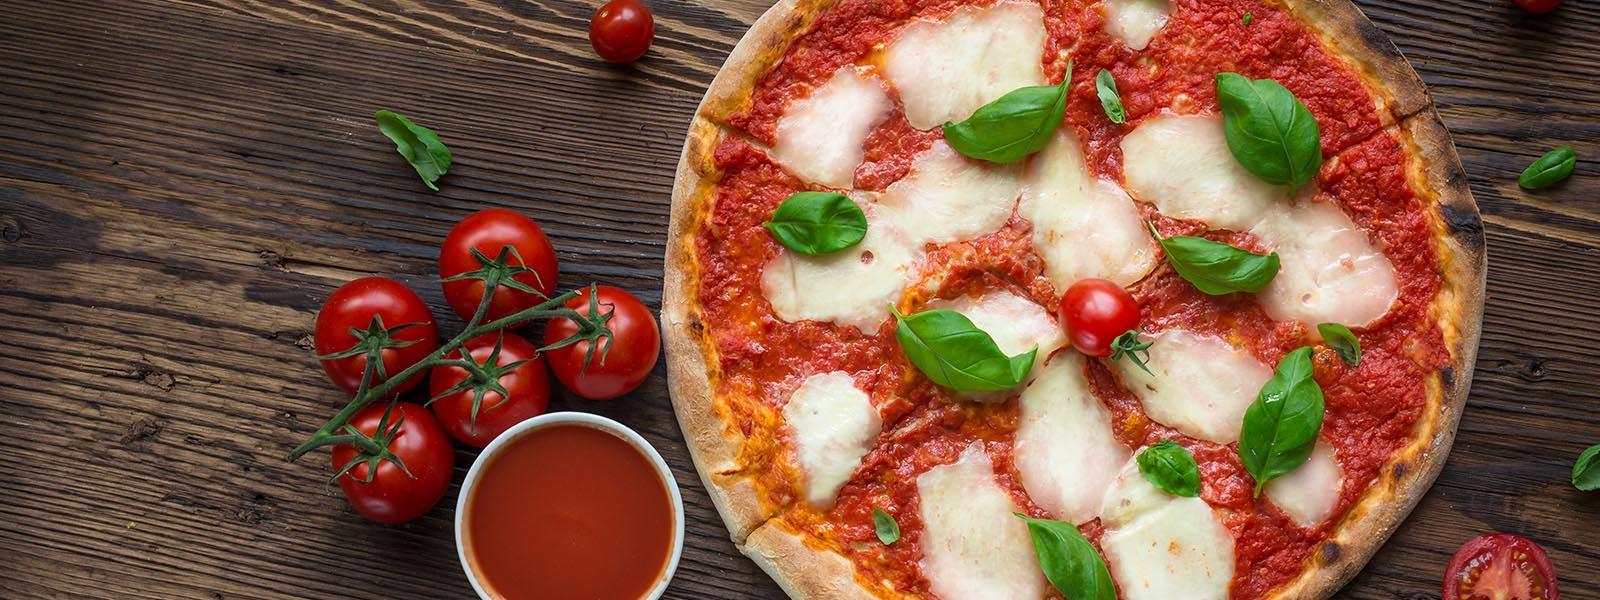 Layton Pizza Layton Pizza Blackpool Takeaway Order Online